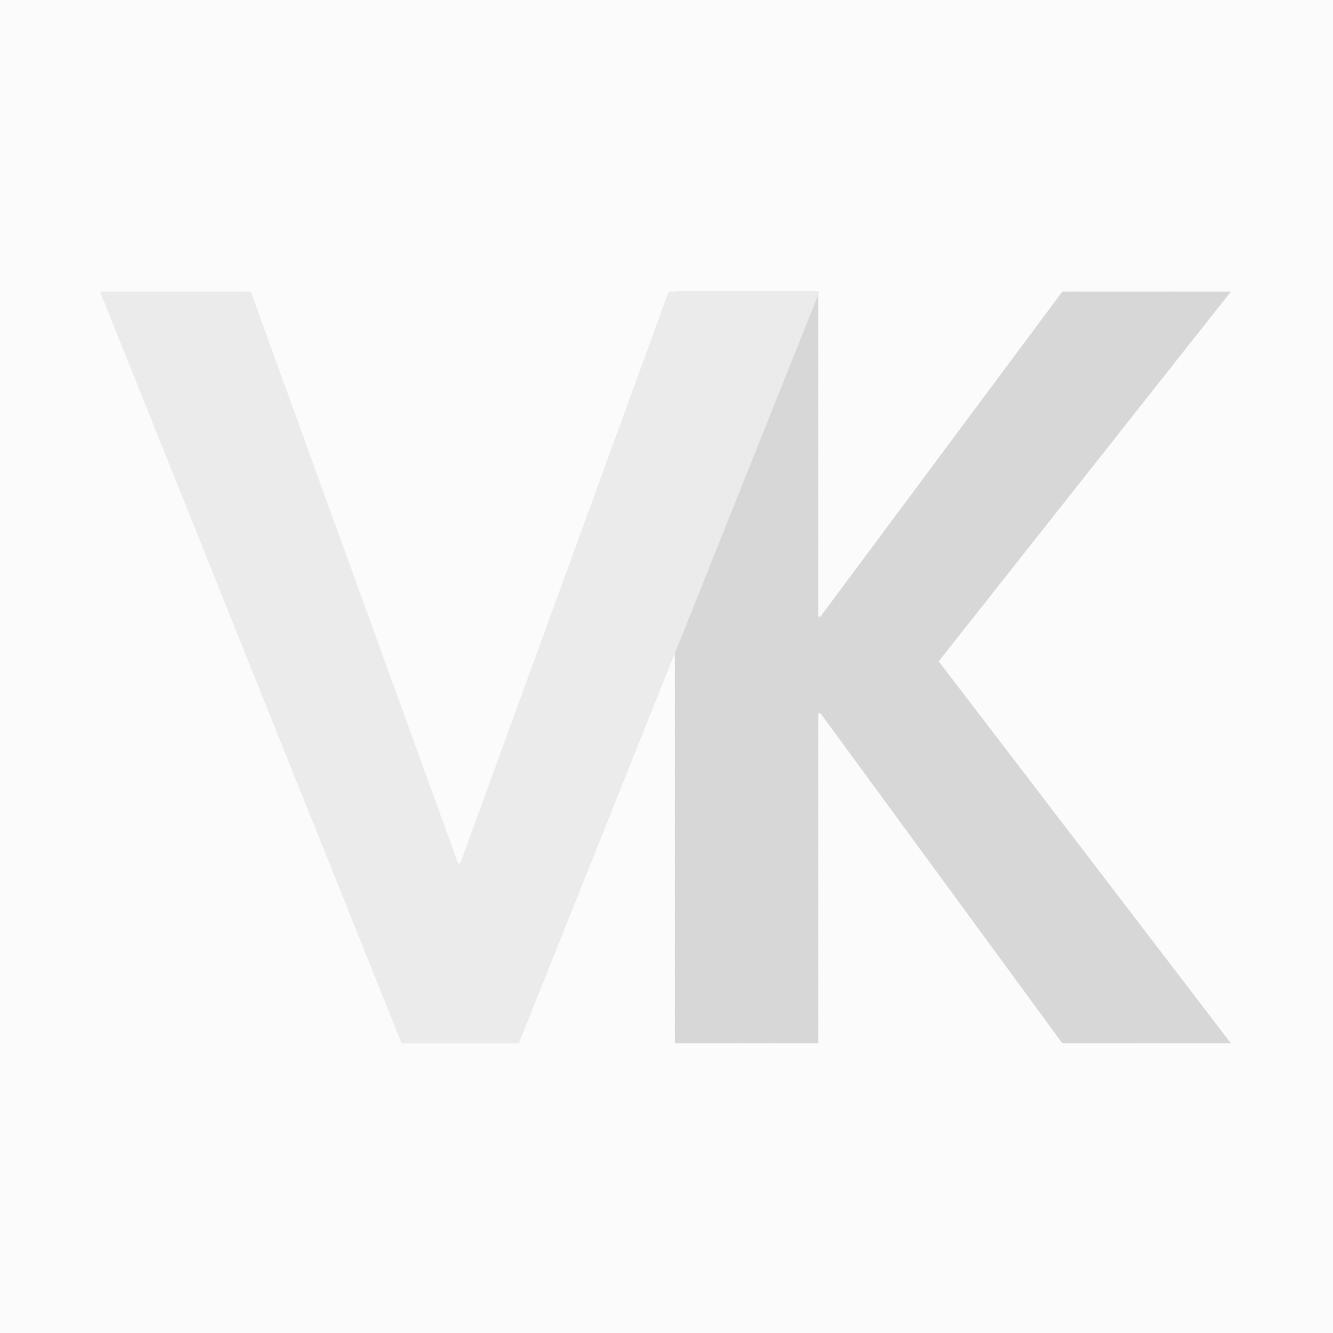 Indola Designer Silkstraightner Normaal Haar Kit